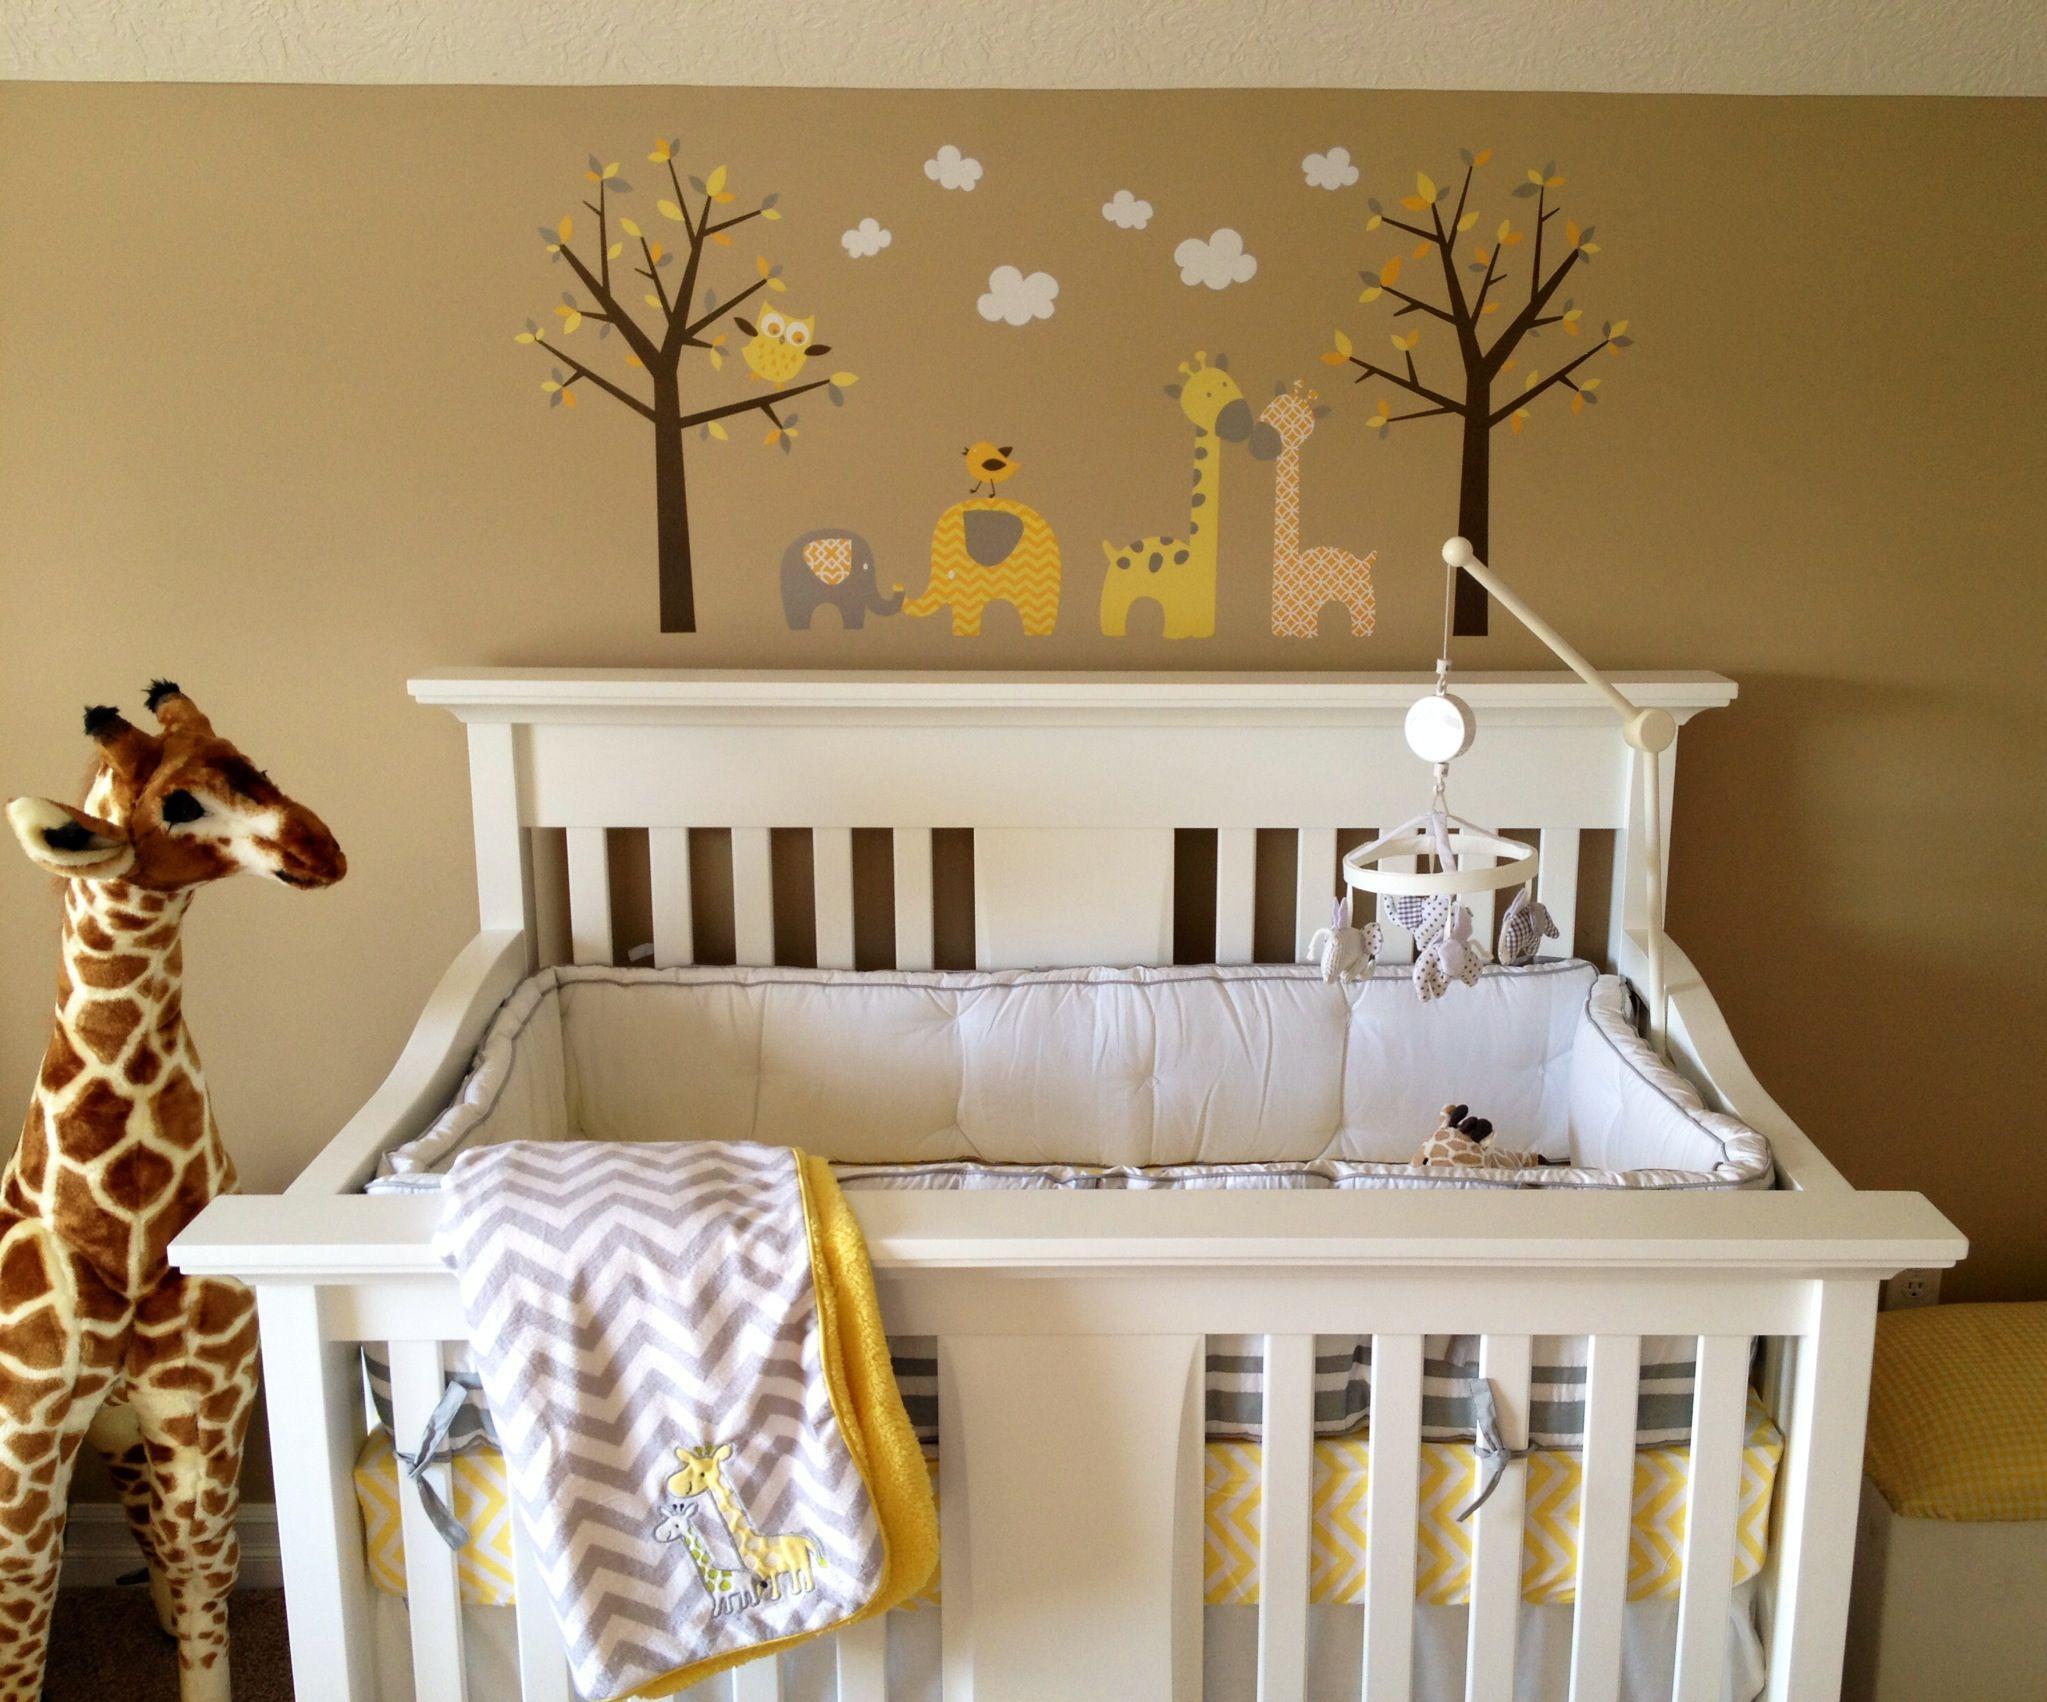 Nursery With Giraffe And Elephant Decal